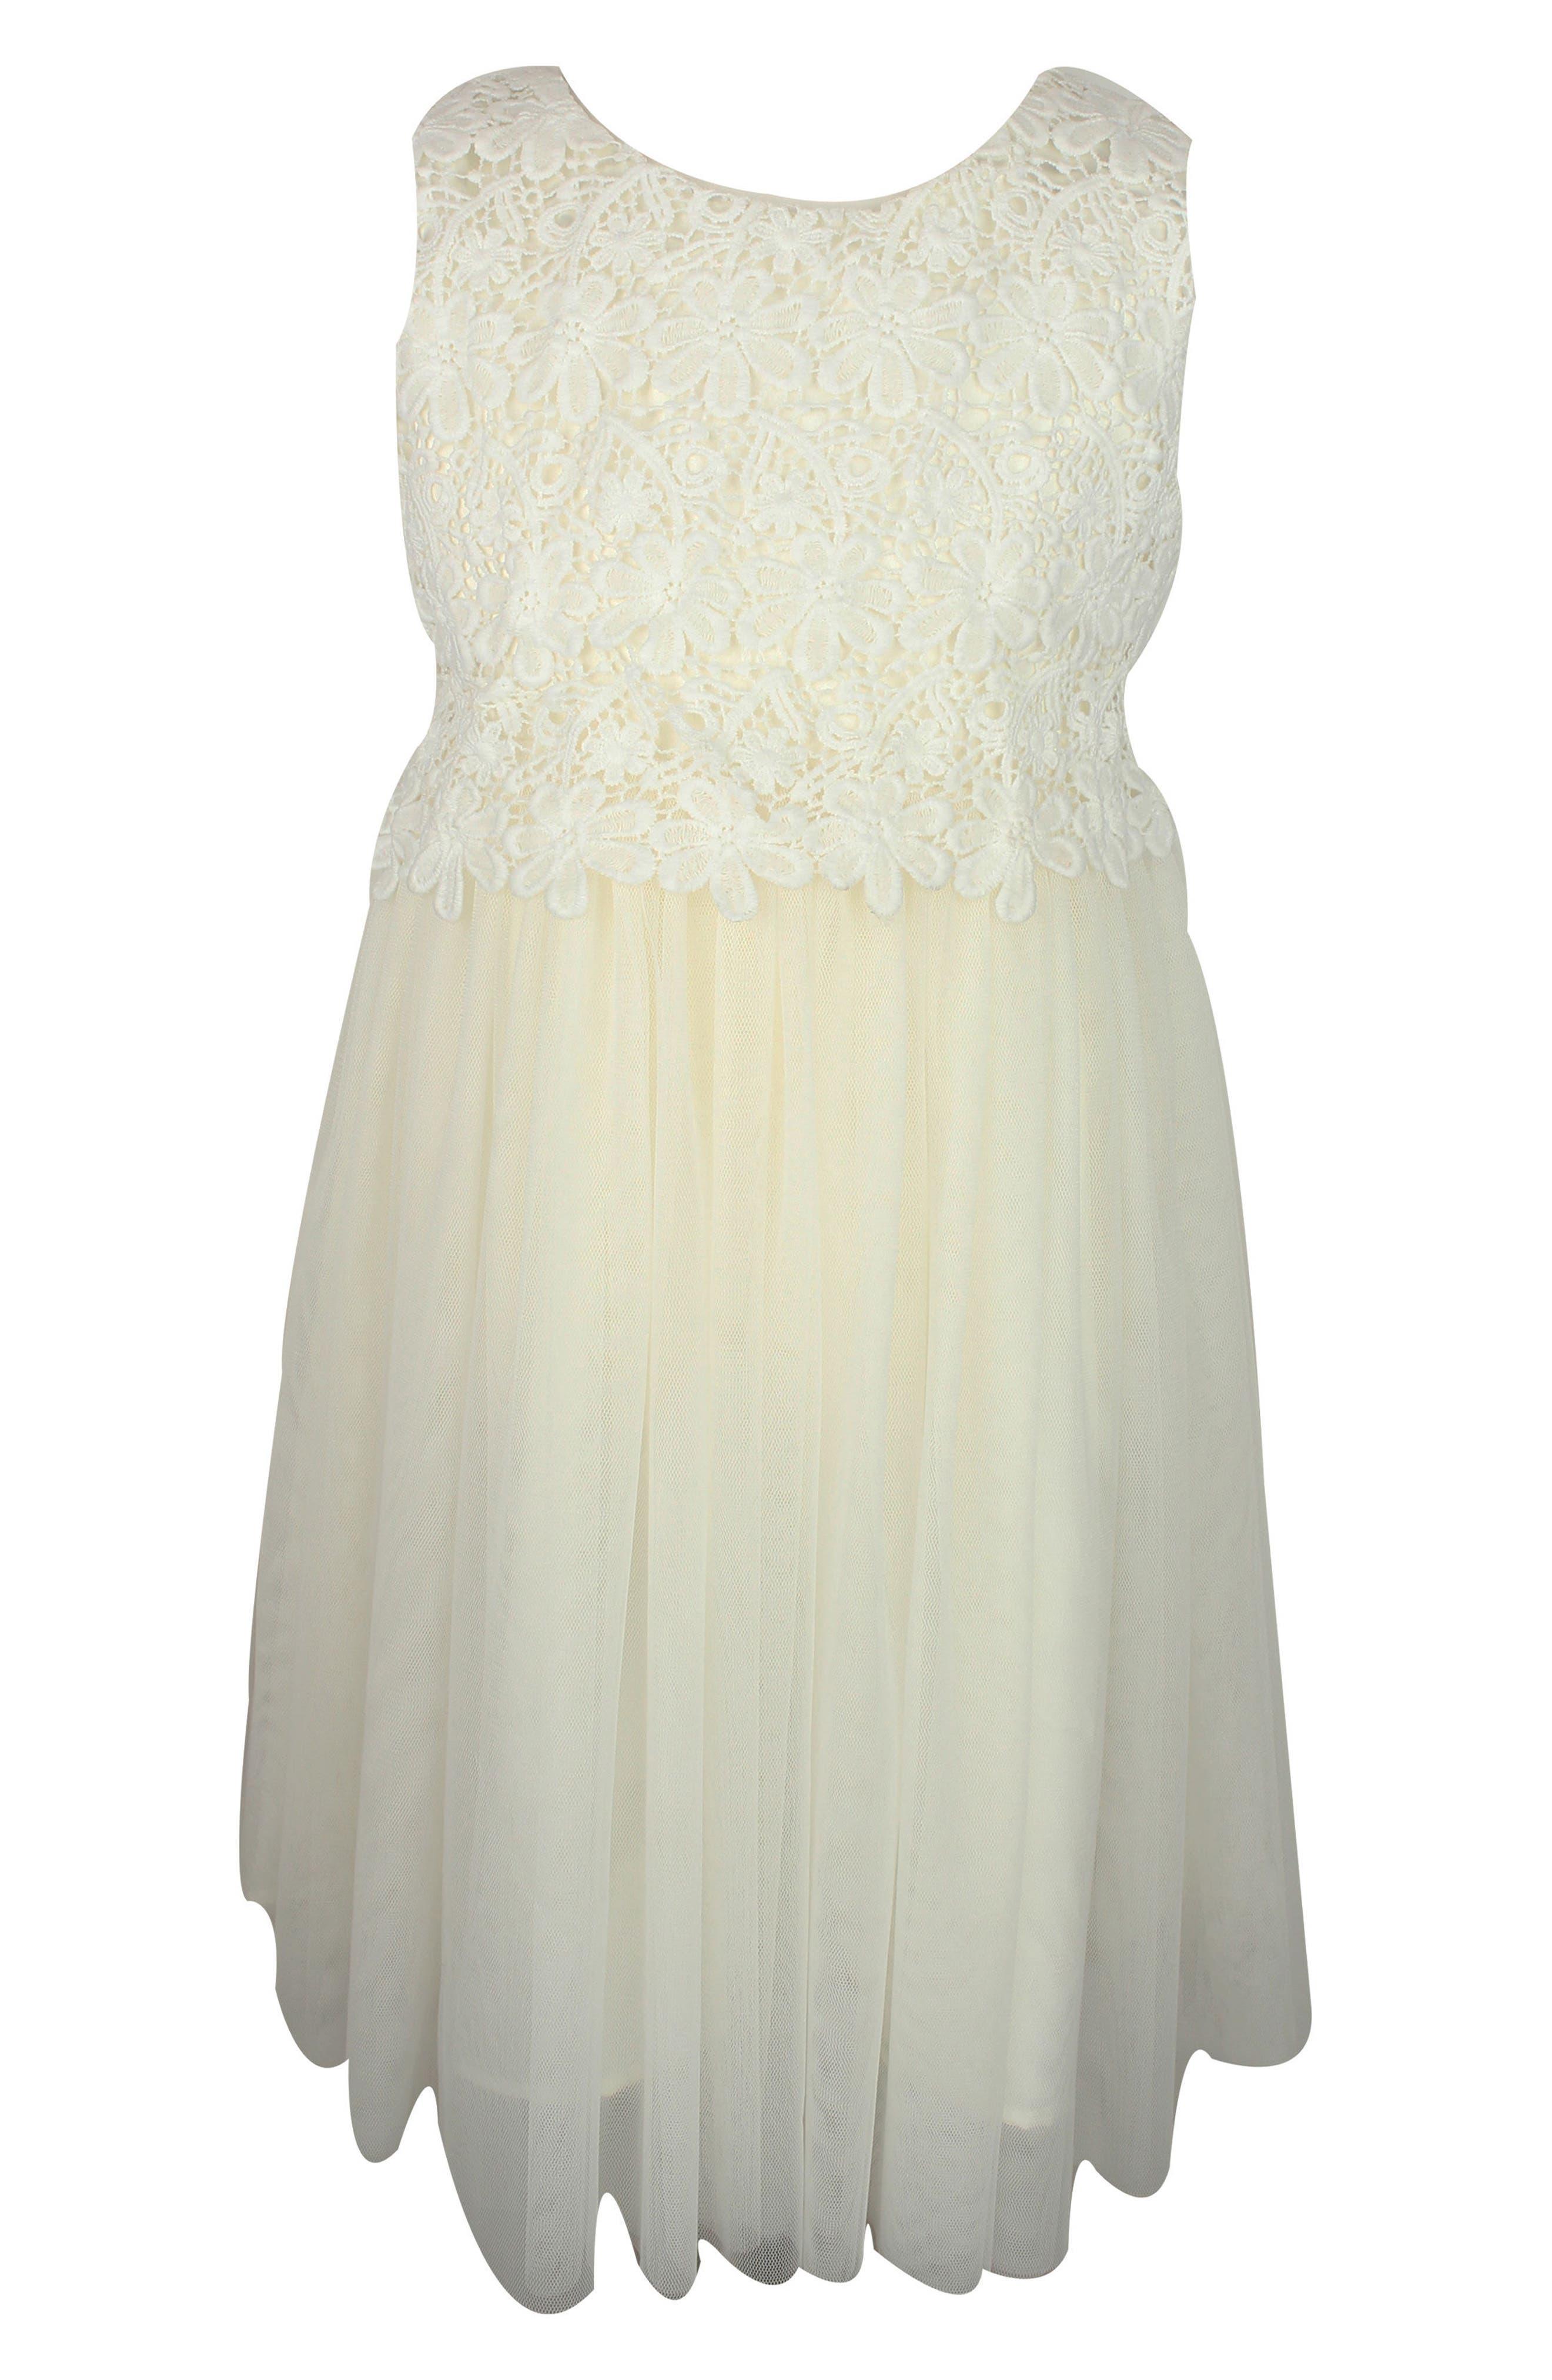 POPATU, Lace Tulle Dress, Main thumbnail 1, color, WHITE